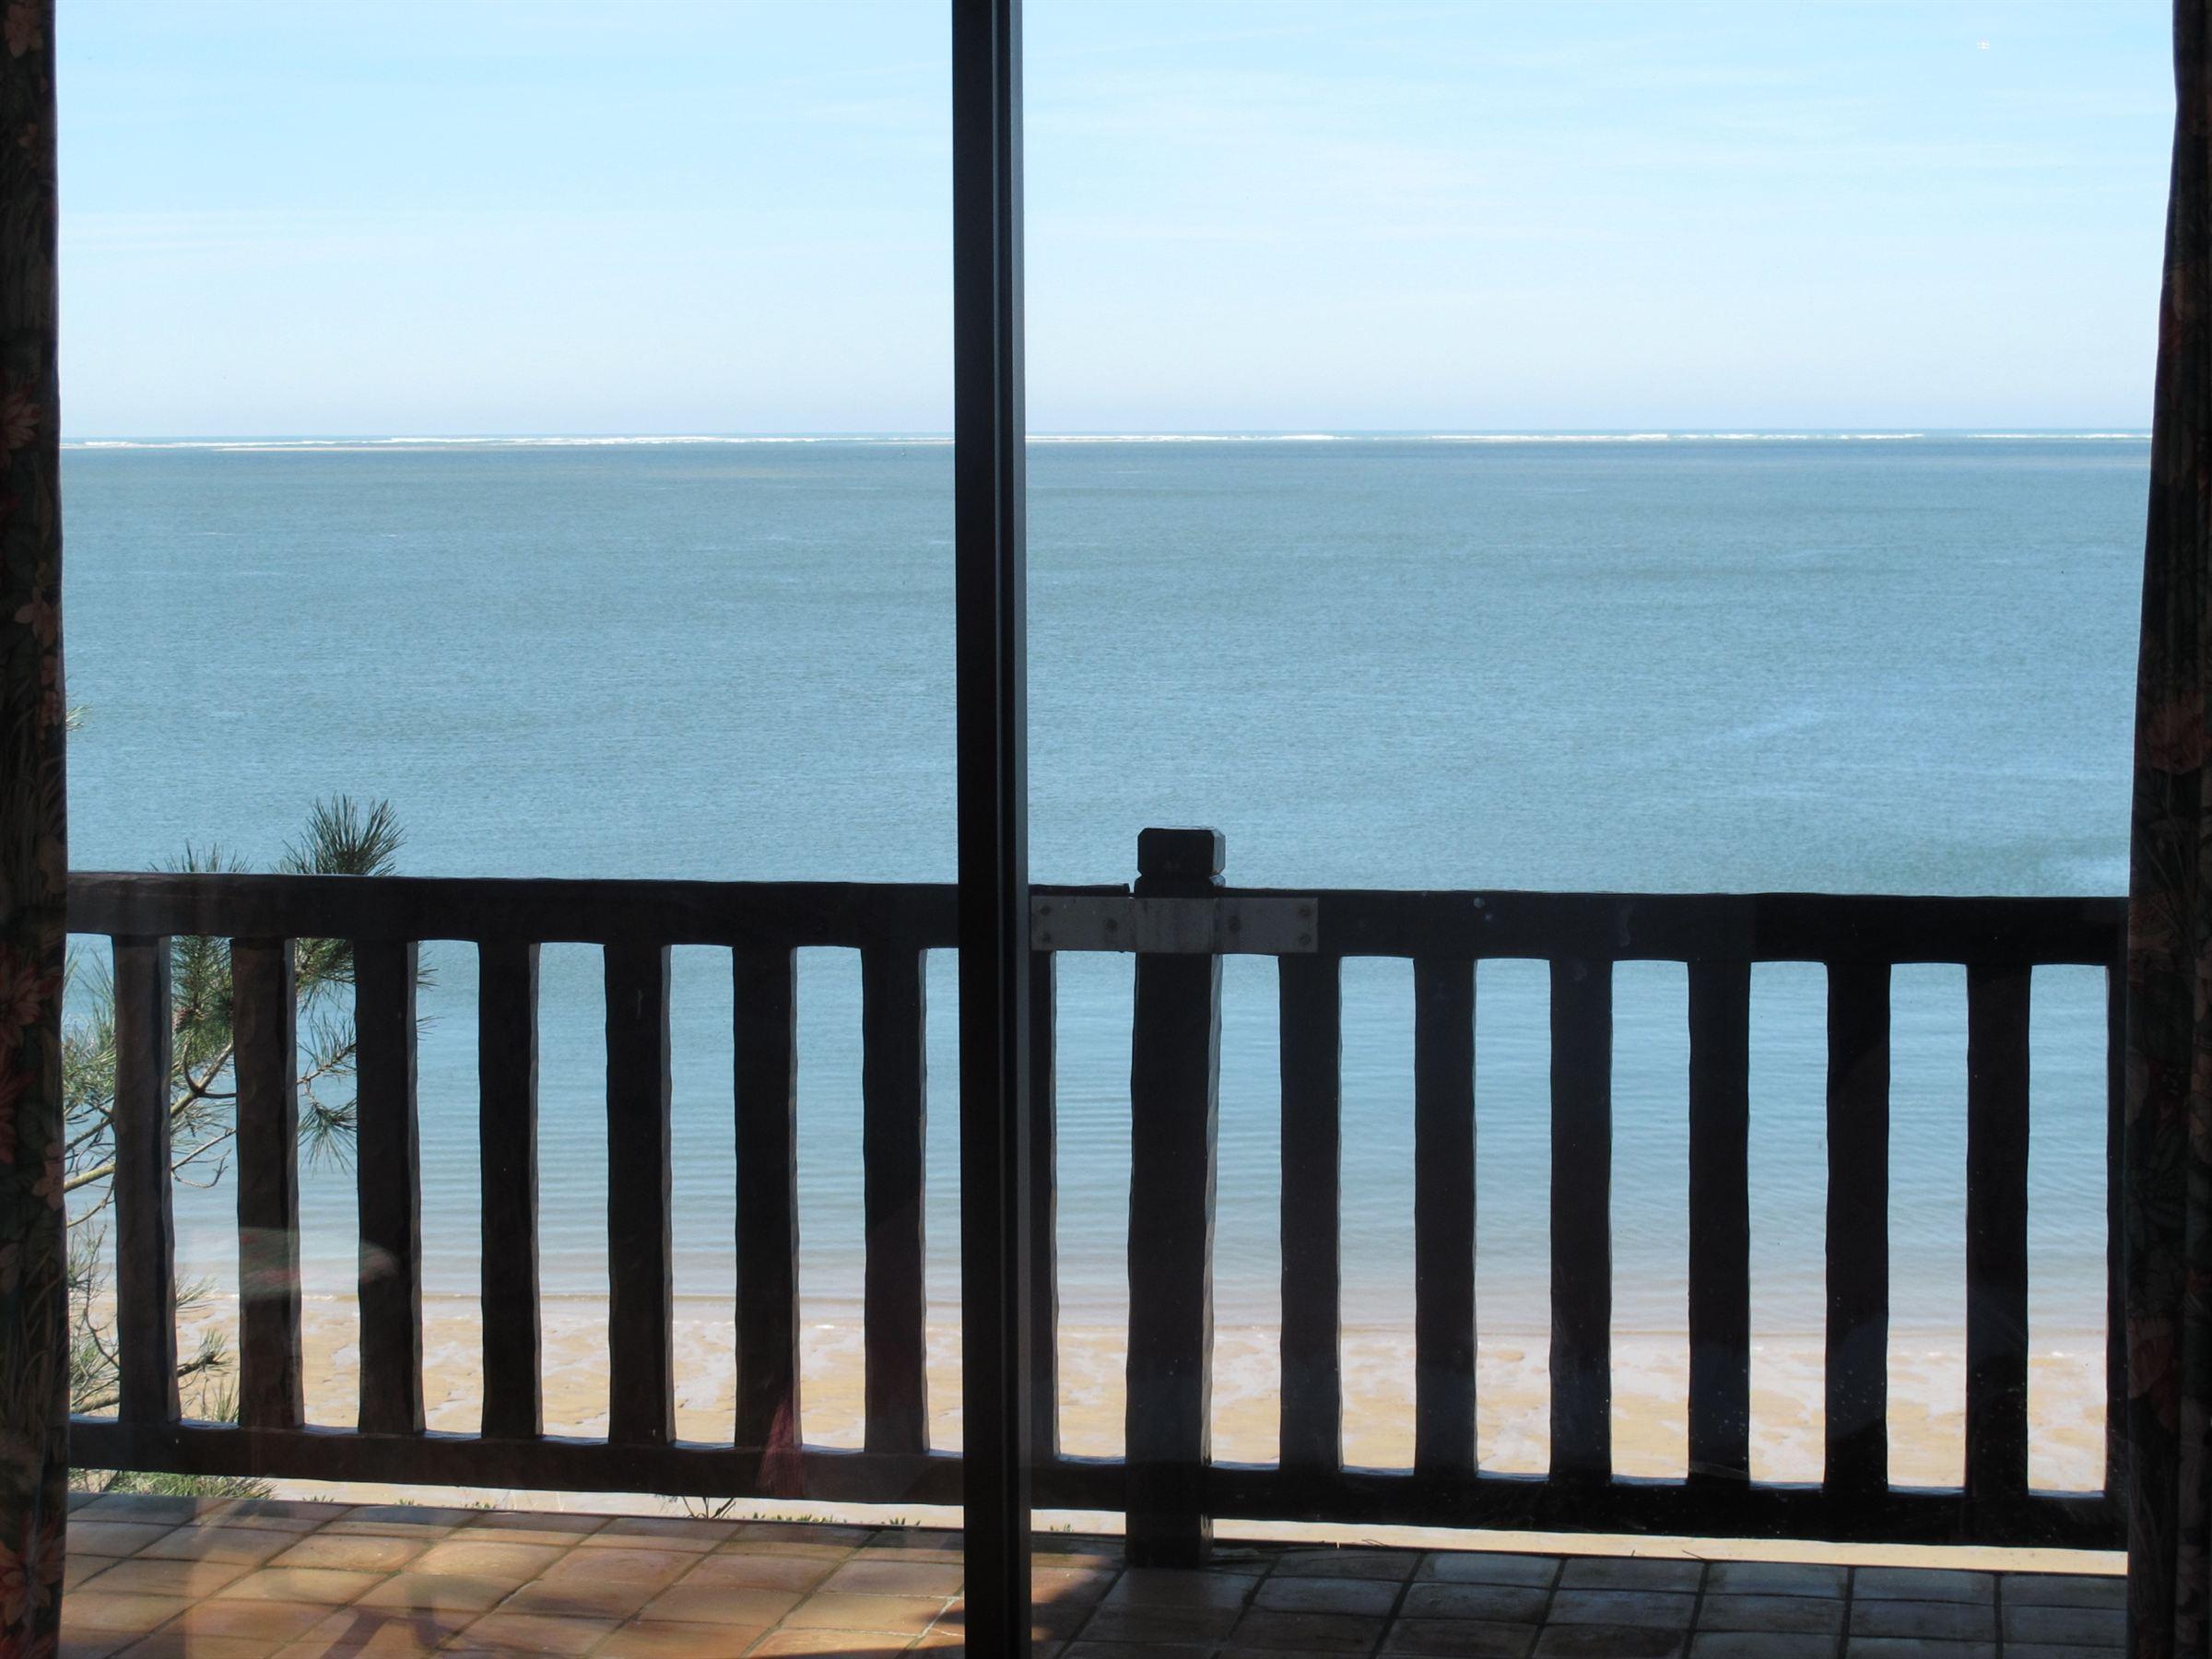 Property For Sale at PYLA SUR MER - FRONT BAY VILLA